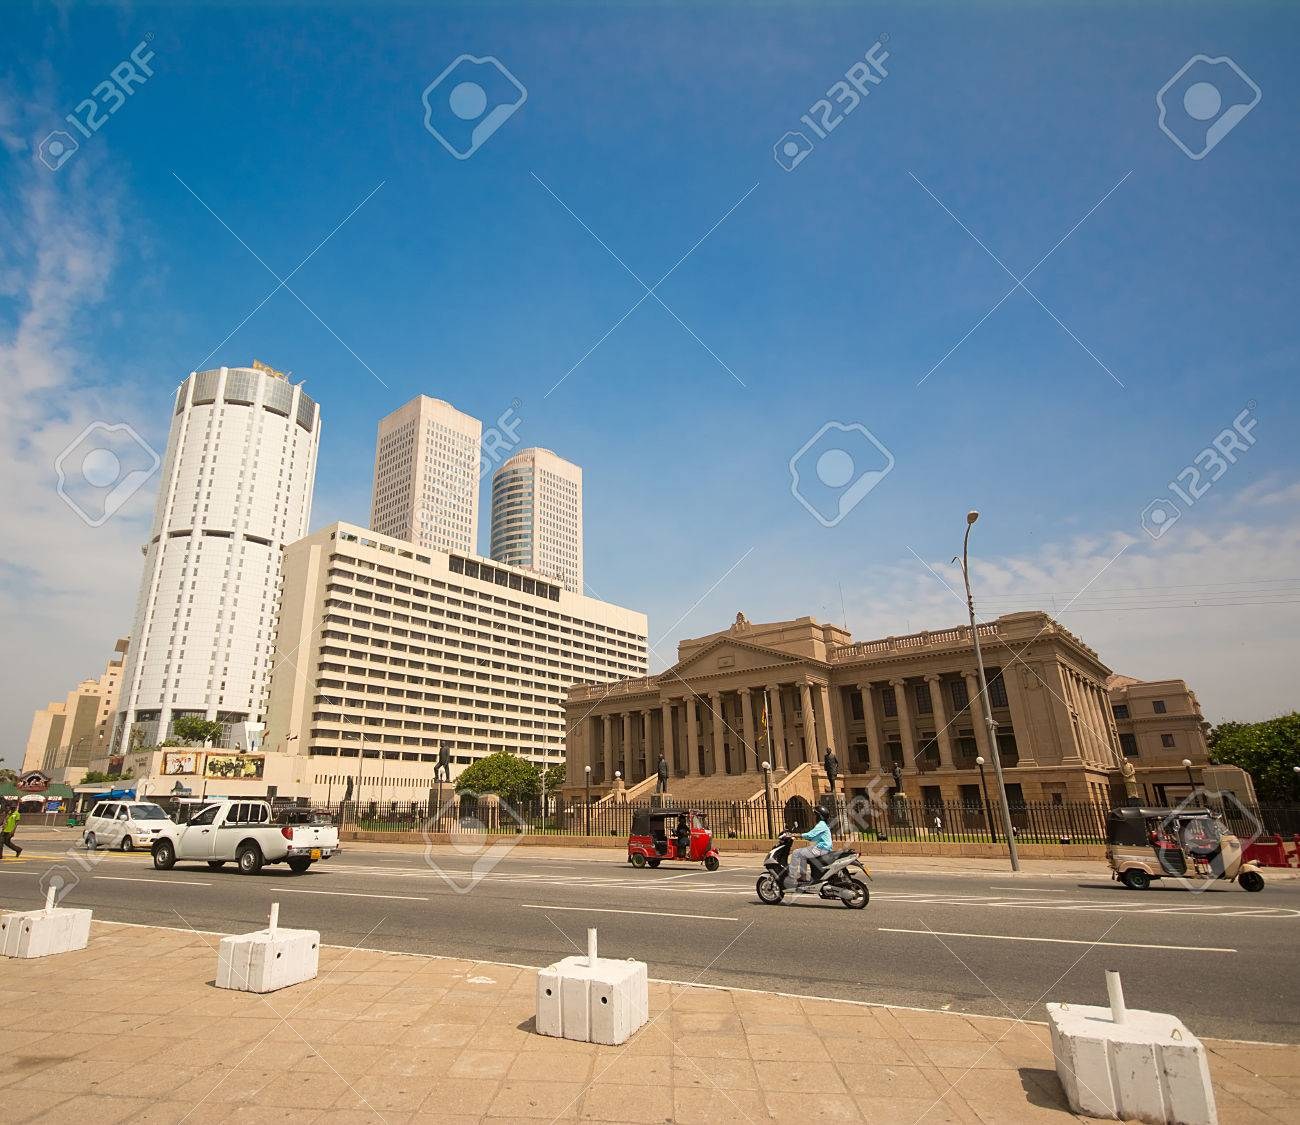 Colombo 15 Juni World Trade Center Und Bank Of Ceylon Gebäude Am